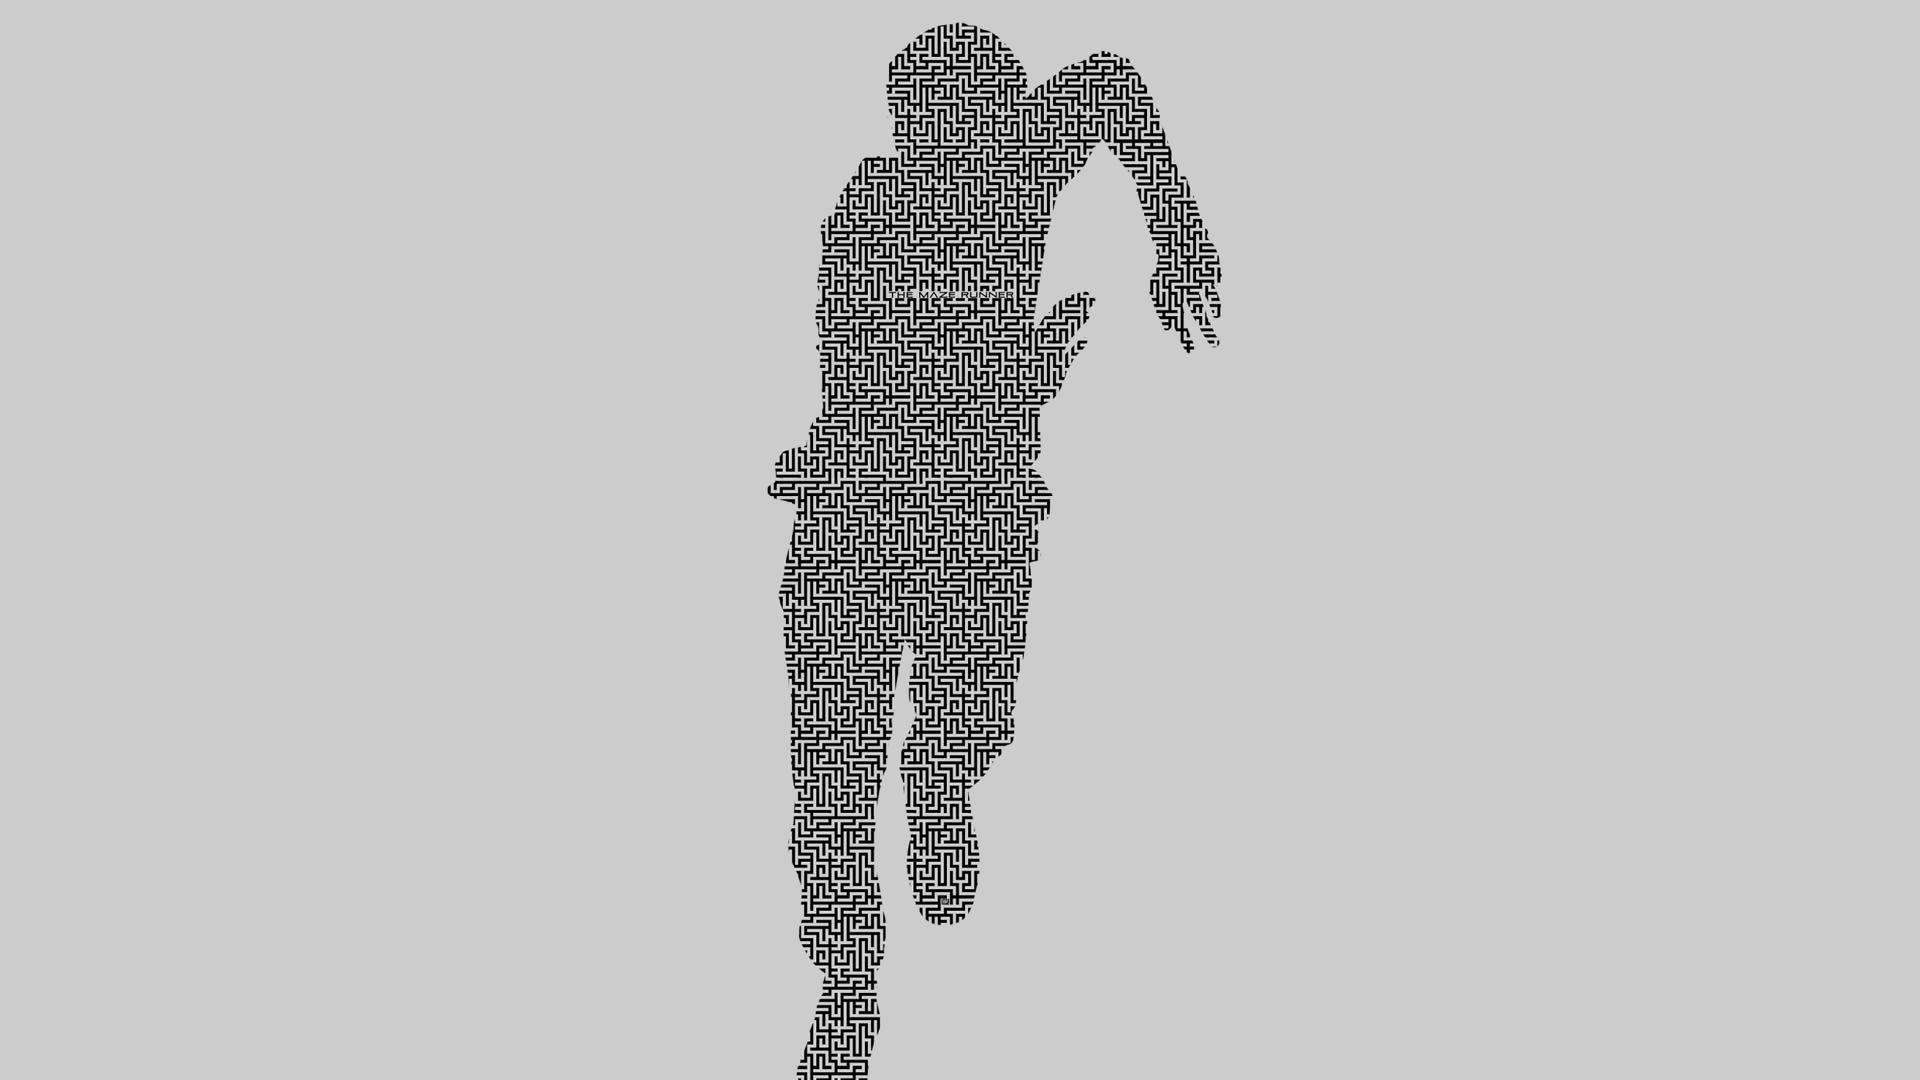 The Maze Runner Wallpapers